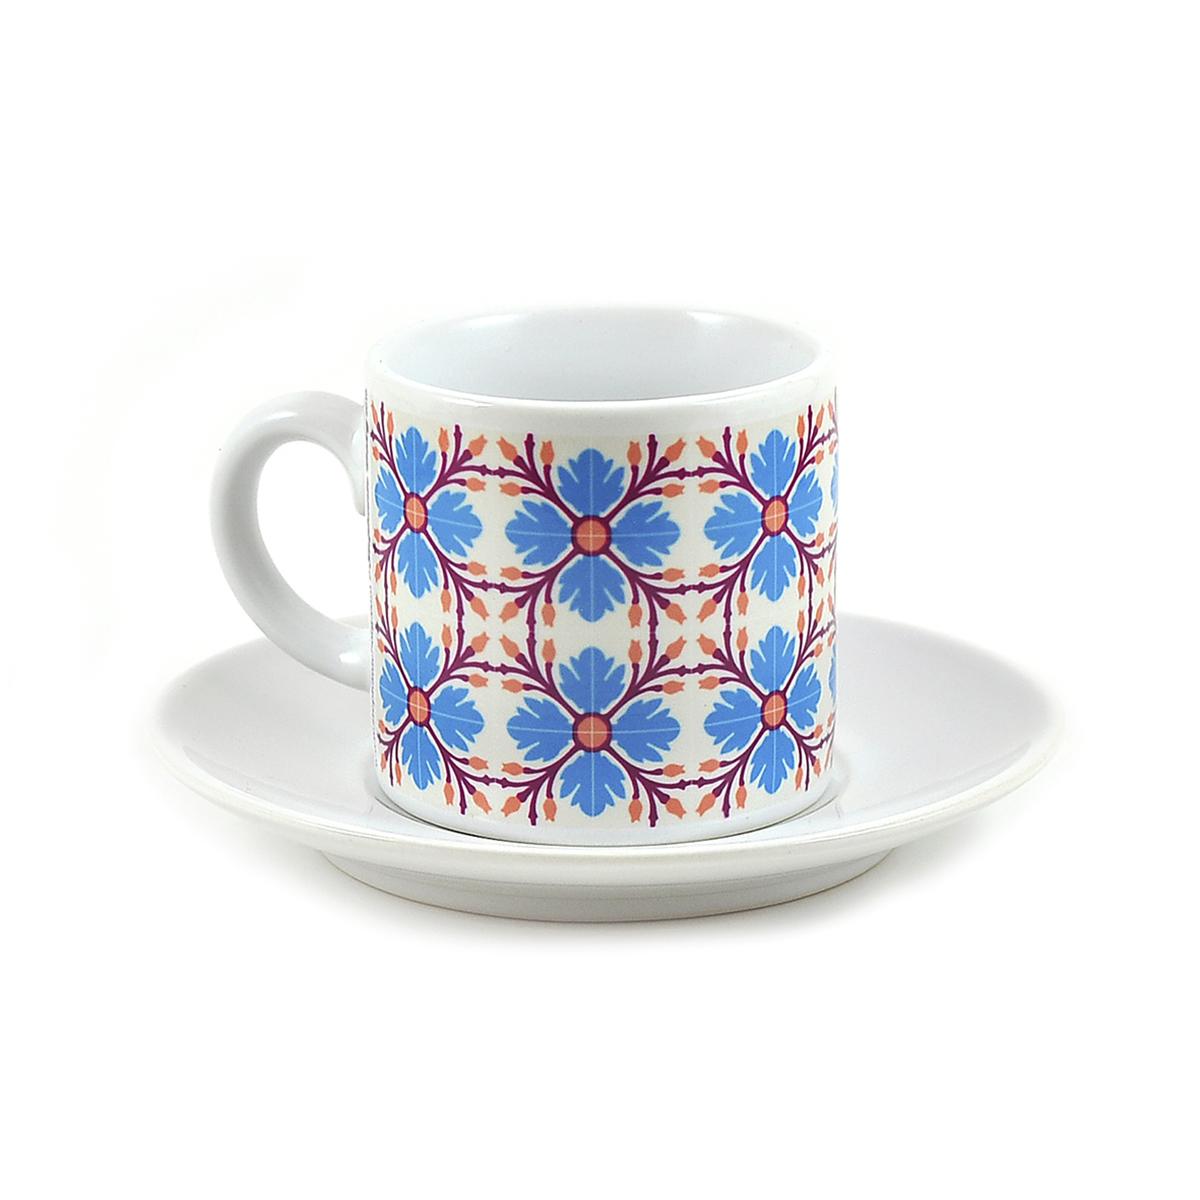 Malta Tile Espresso Cup & Saucer, pattern no.9